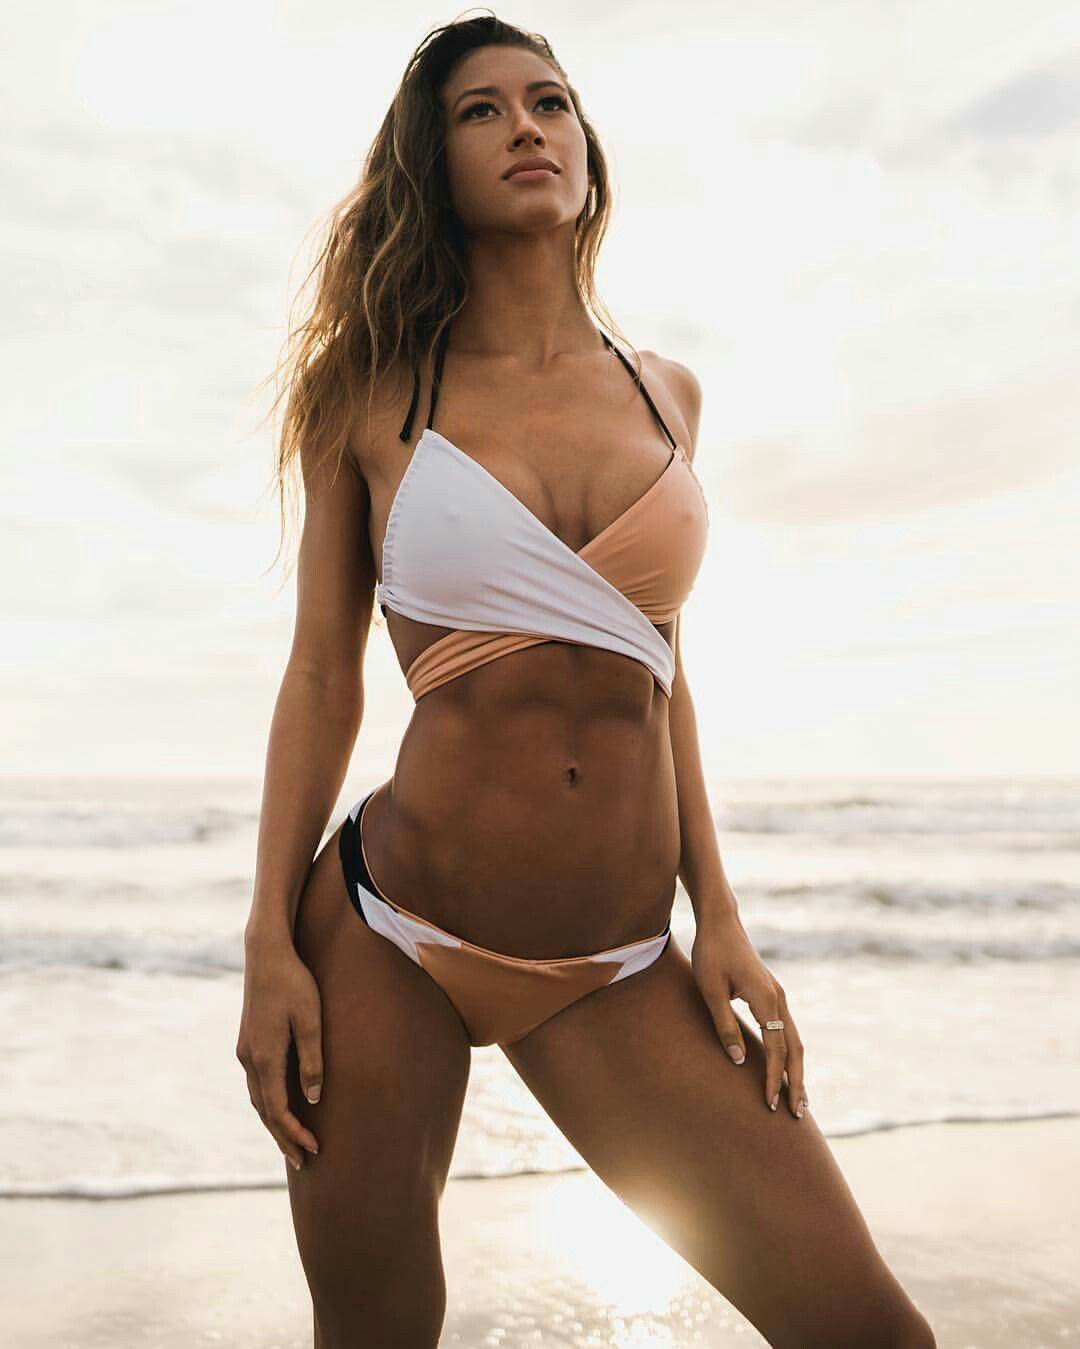 Video Karina Elle nude (79 photo), Ass, Leaked, Boobs, in bikini 2018